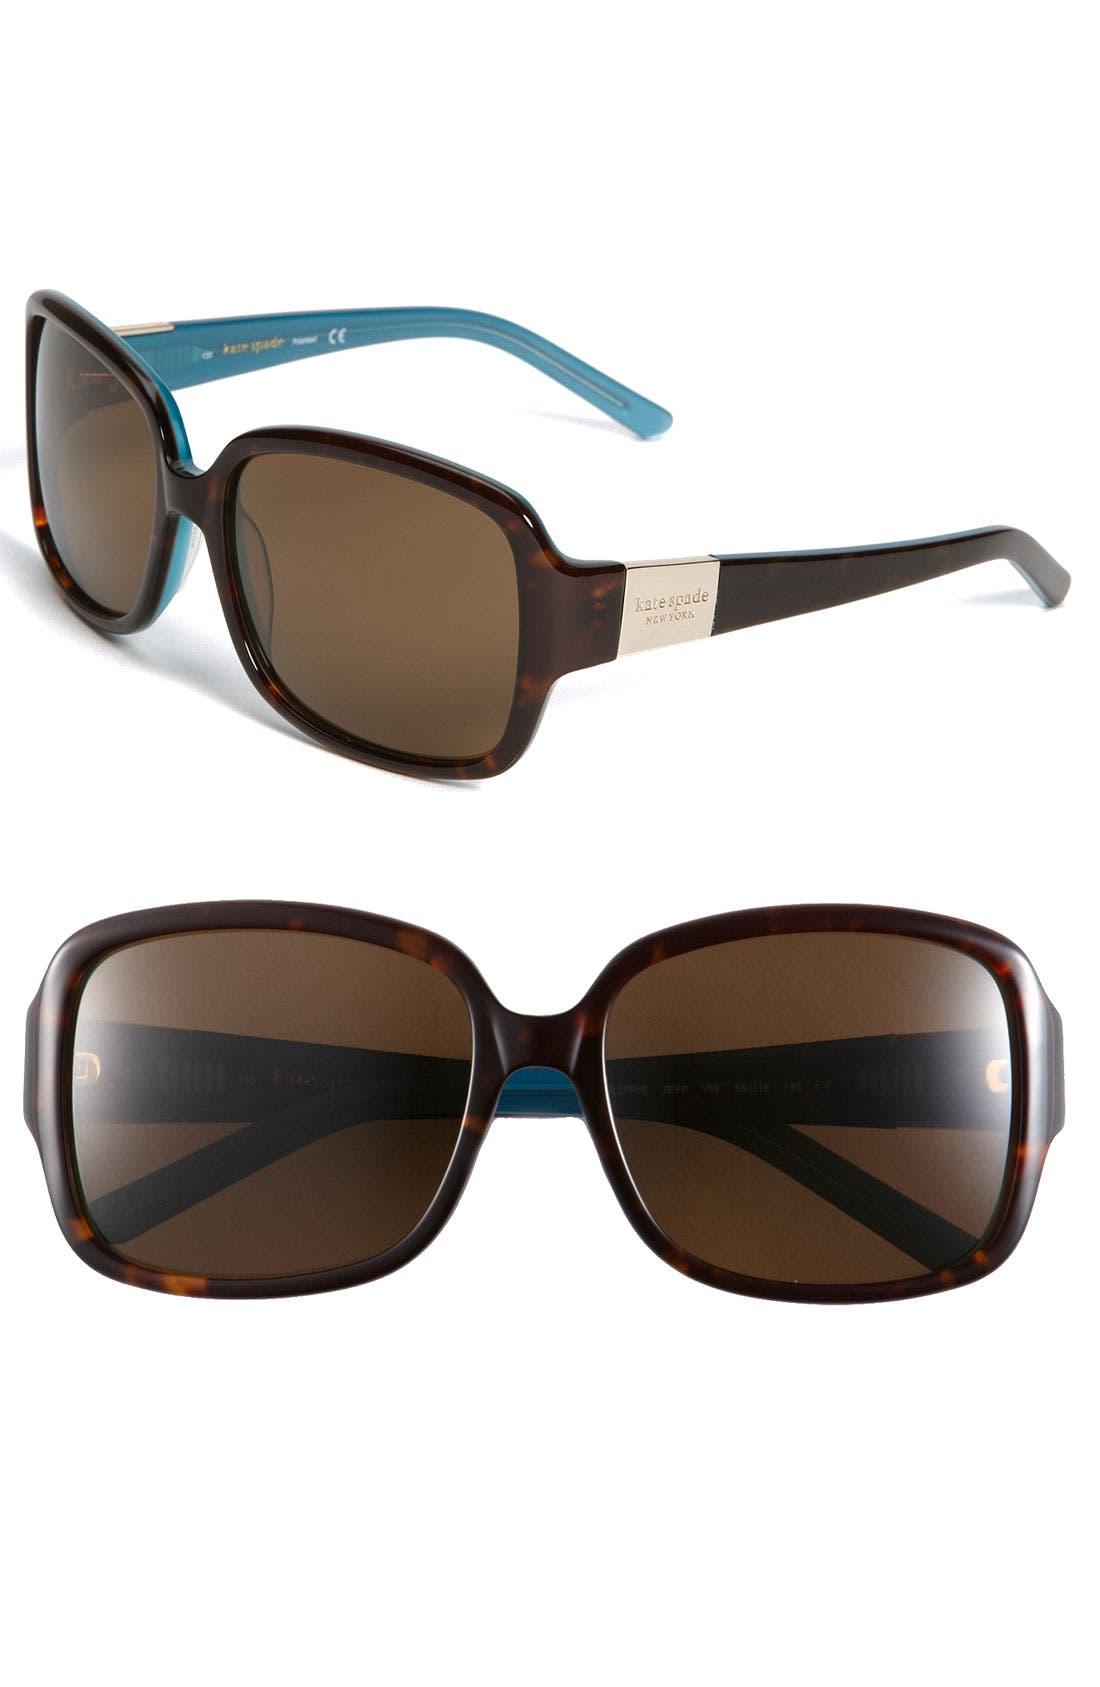 Alternate Image 1 Selected - kate spade new york 'lulu/p/s' 55mm polarized square sunglasses